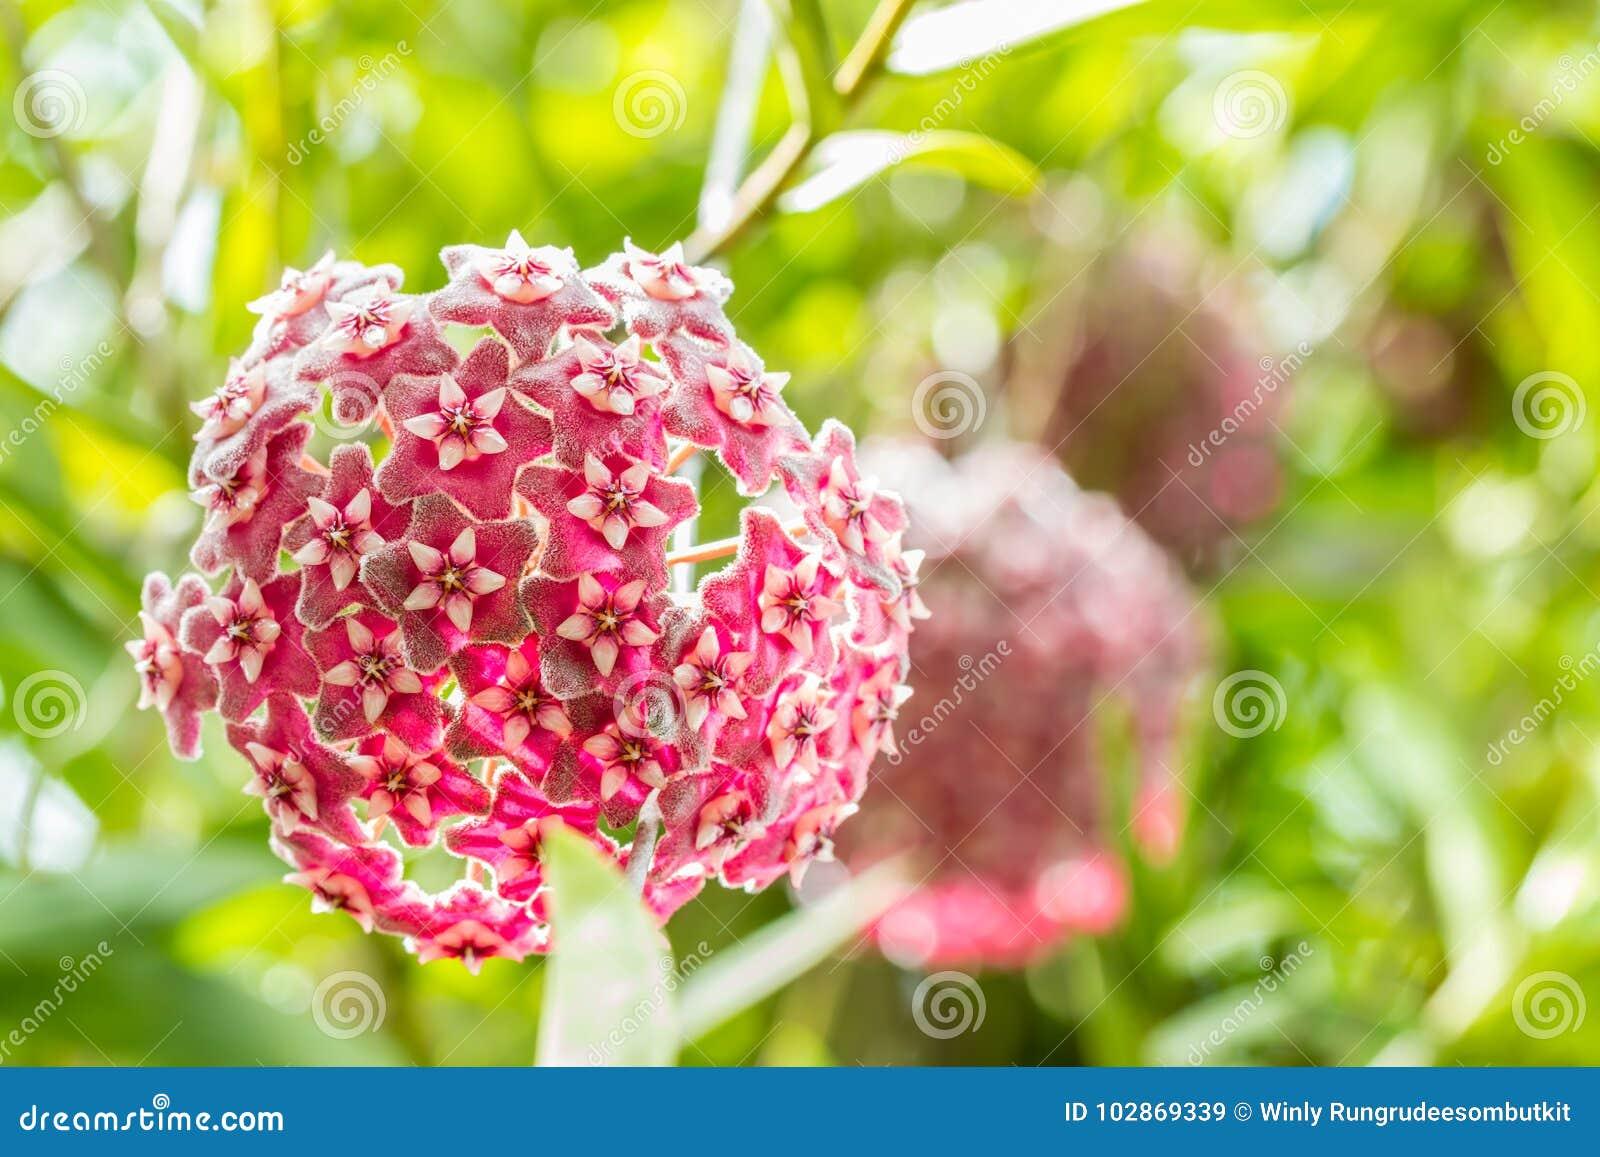 Red flowers, Wax plant, Hoya ovalifolia Wight & Arn.